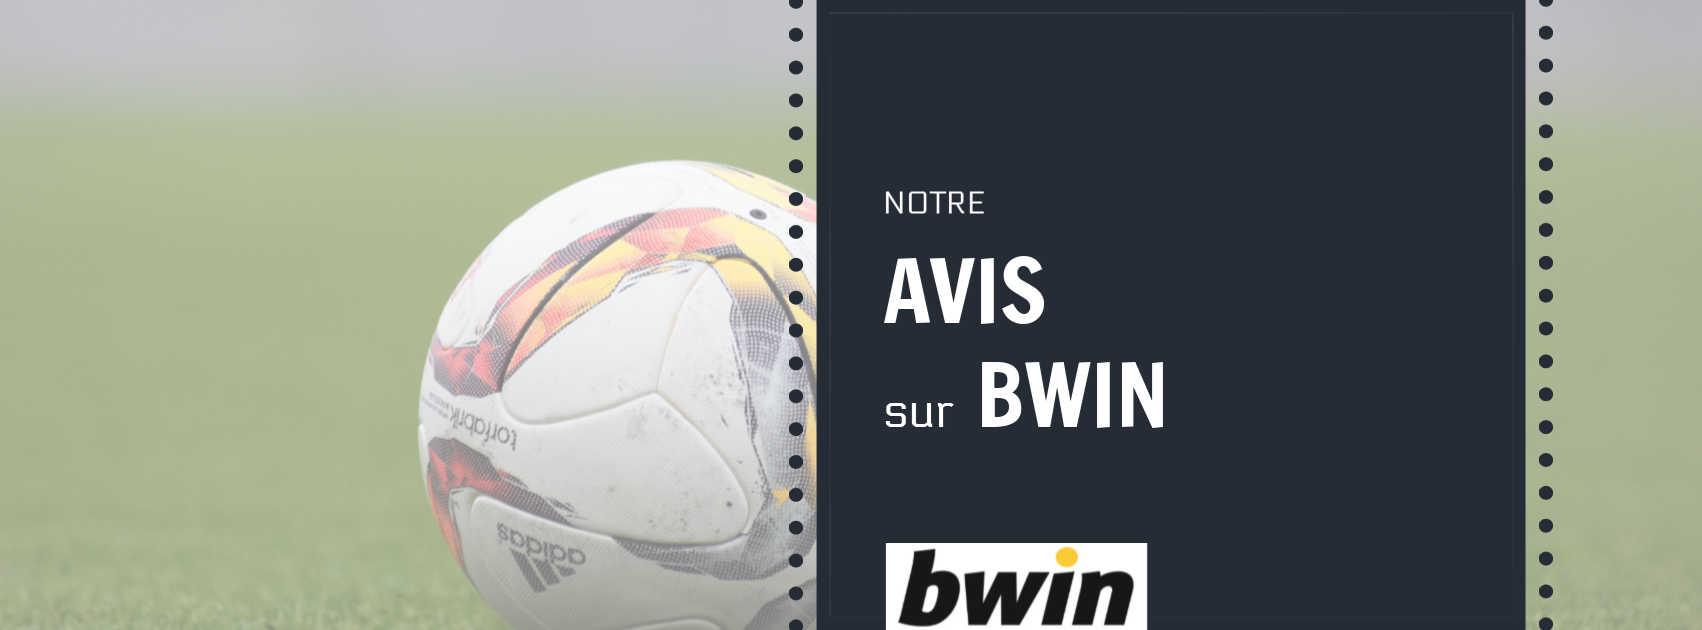 avis site de paris bwin